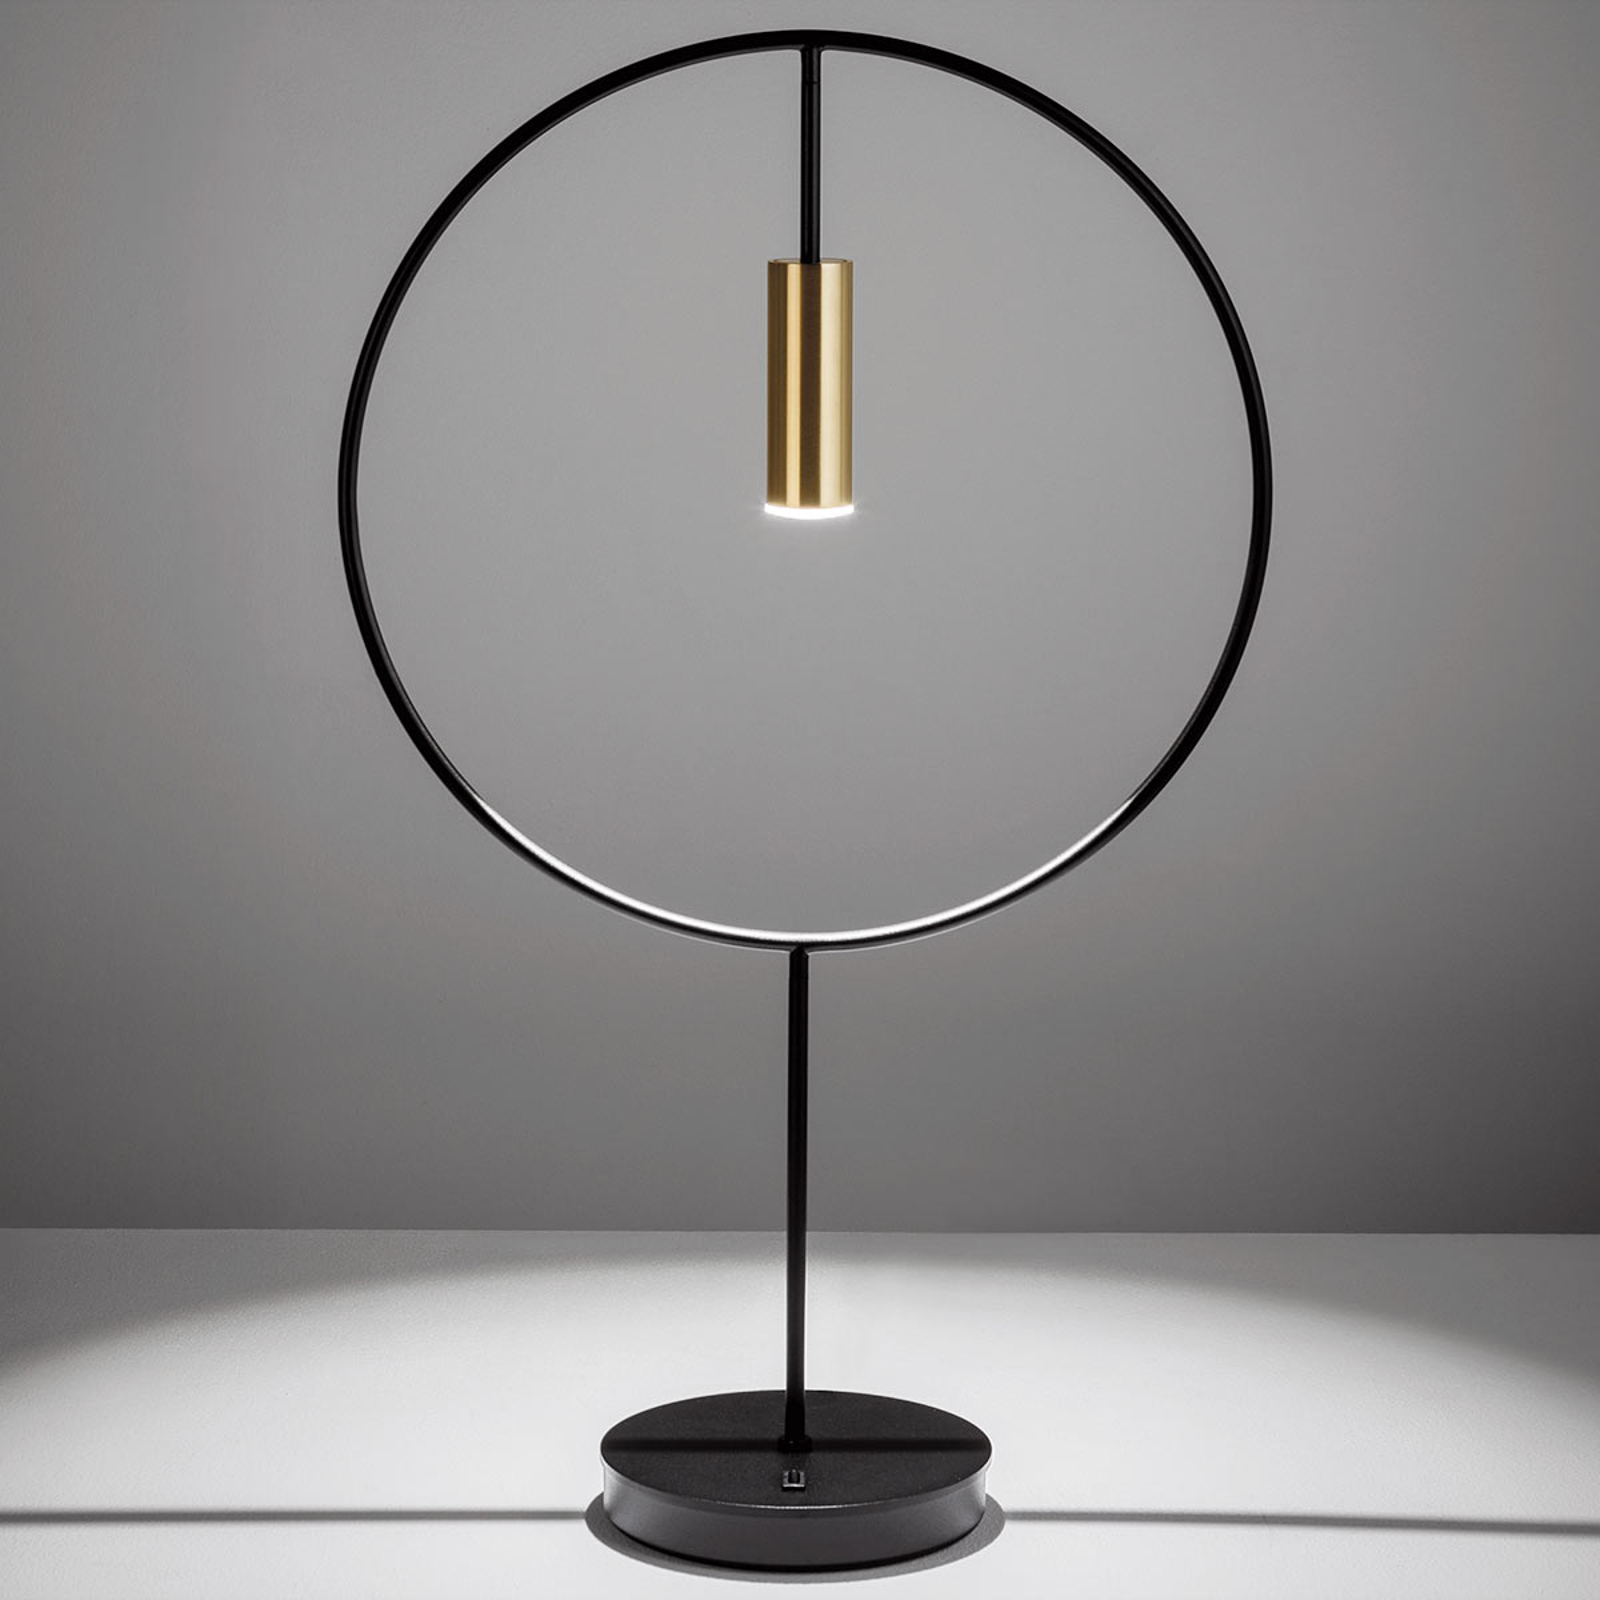 Lampe à poser de designer LED Revolta, doré